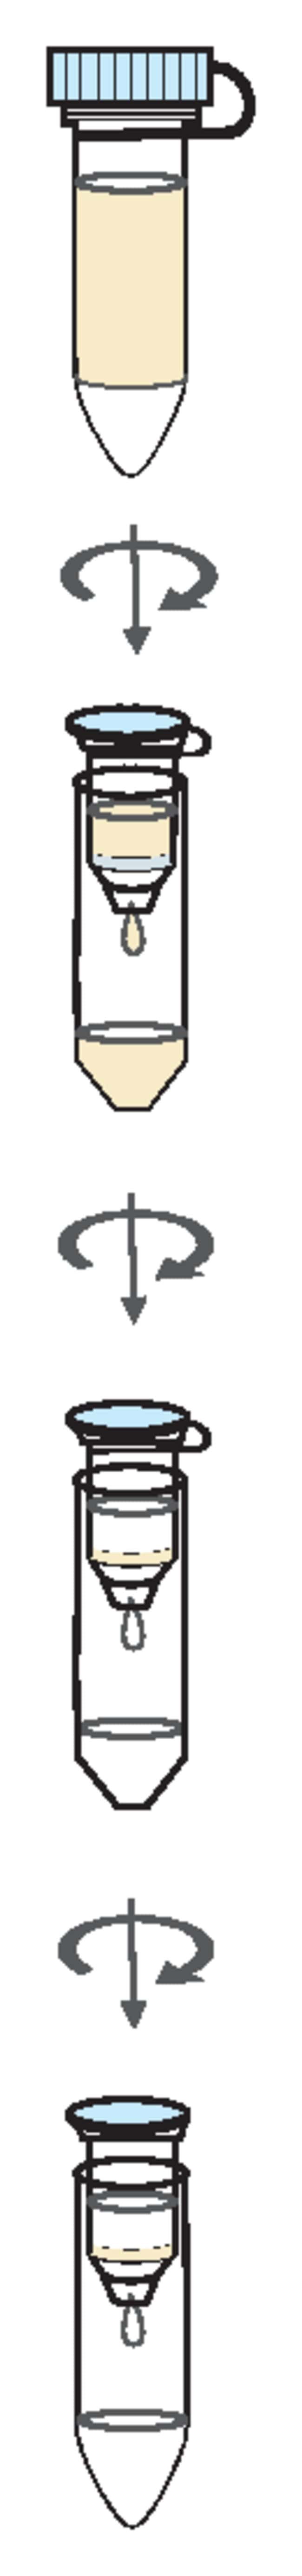 Thermo Scientific™GeneJET Plasmid Miniprep Kit: Biochemicals and Reagents Life Sciences